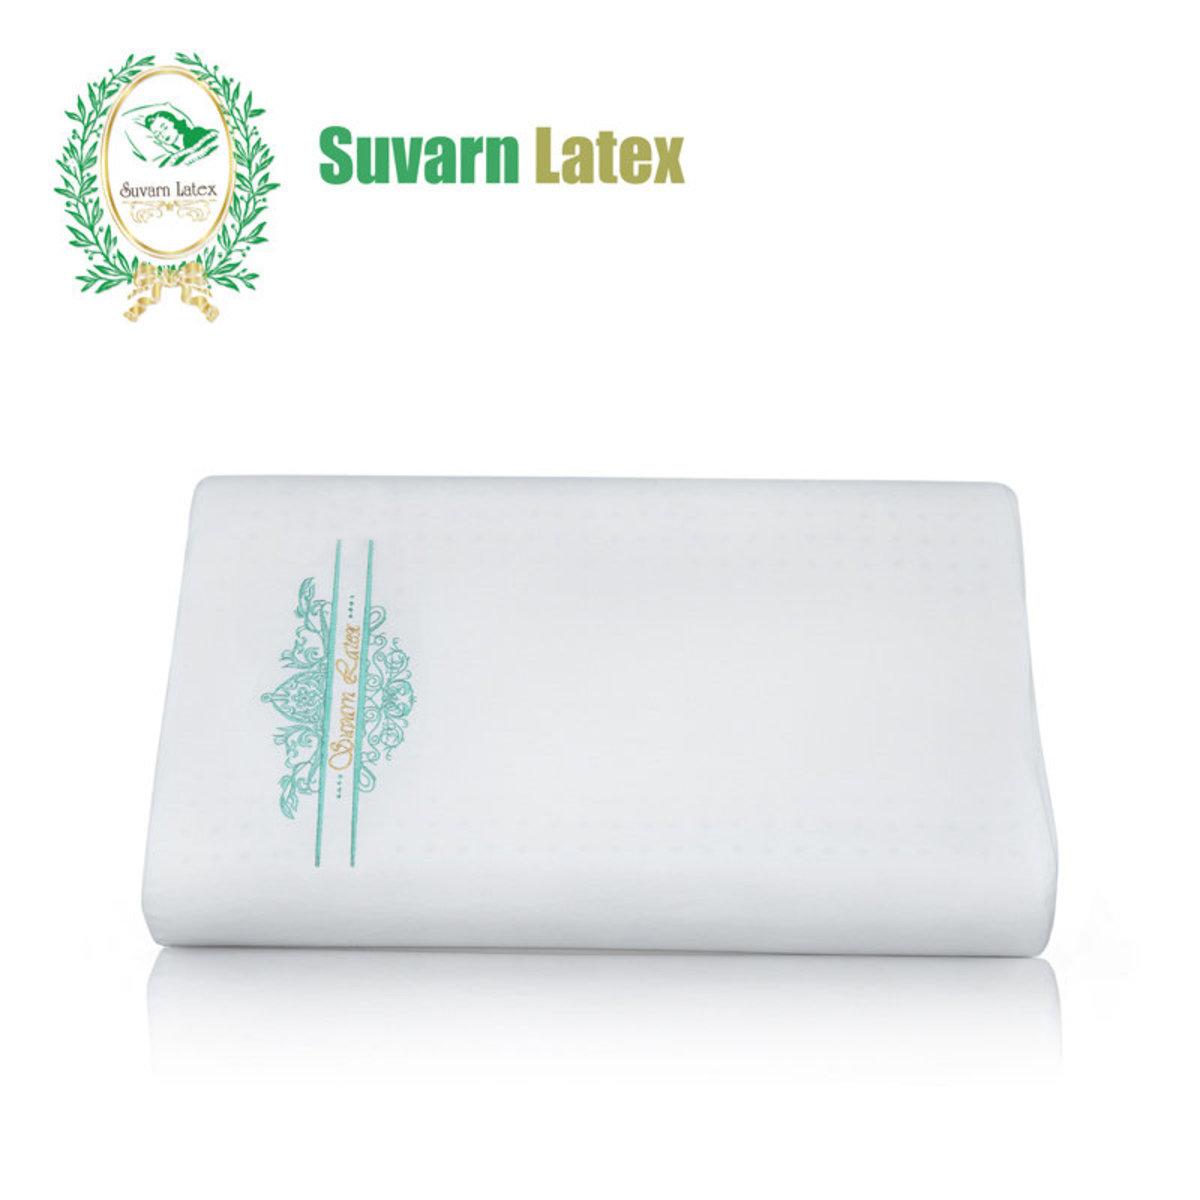 SUVARN SVF2 Latex Pillow (Adult)